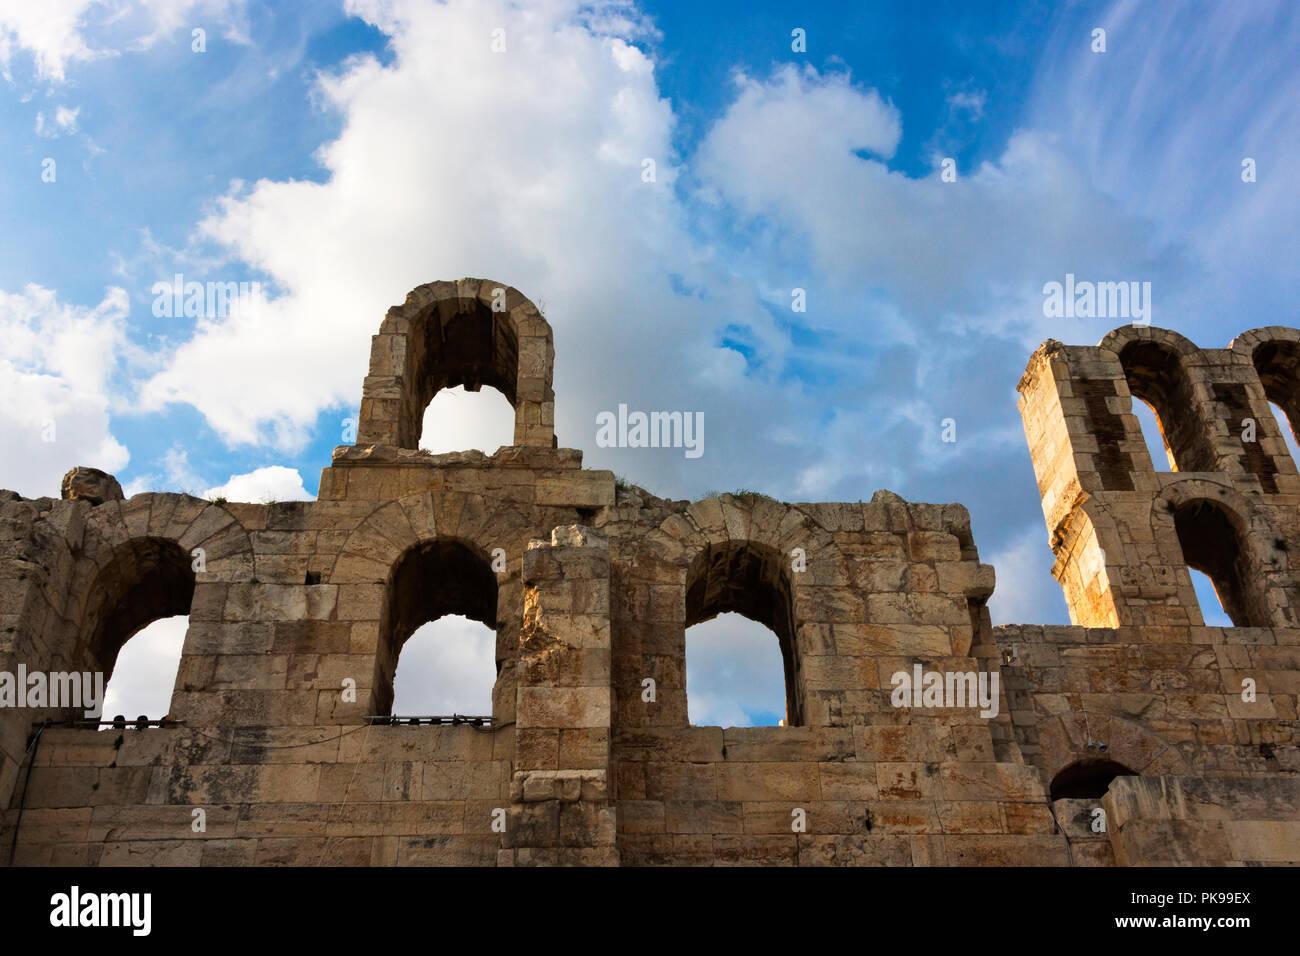 Odeon of Herodes Atticus, Acropolis of Athens, Greece - Stock Image